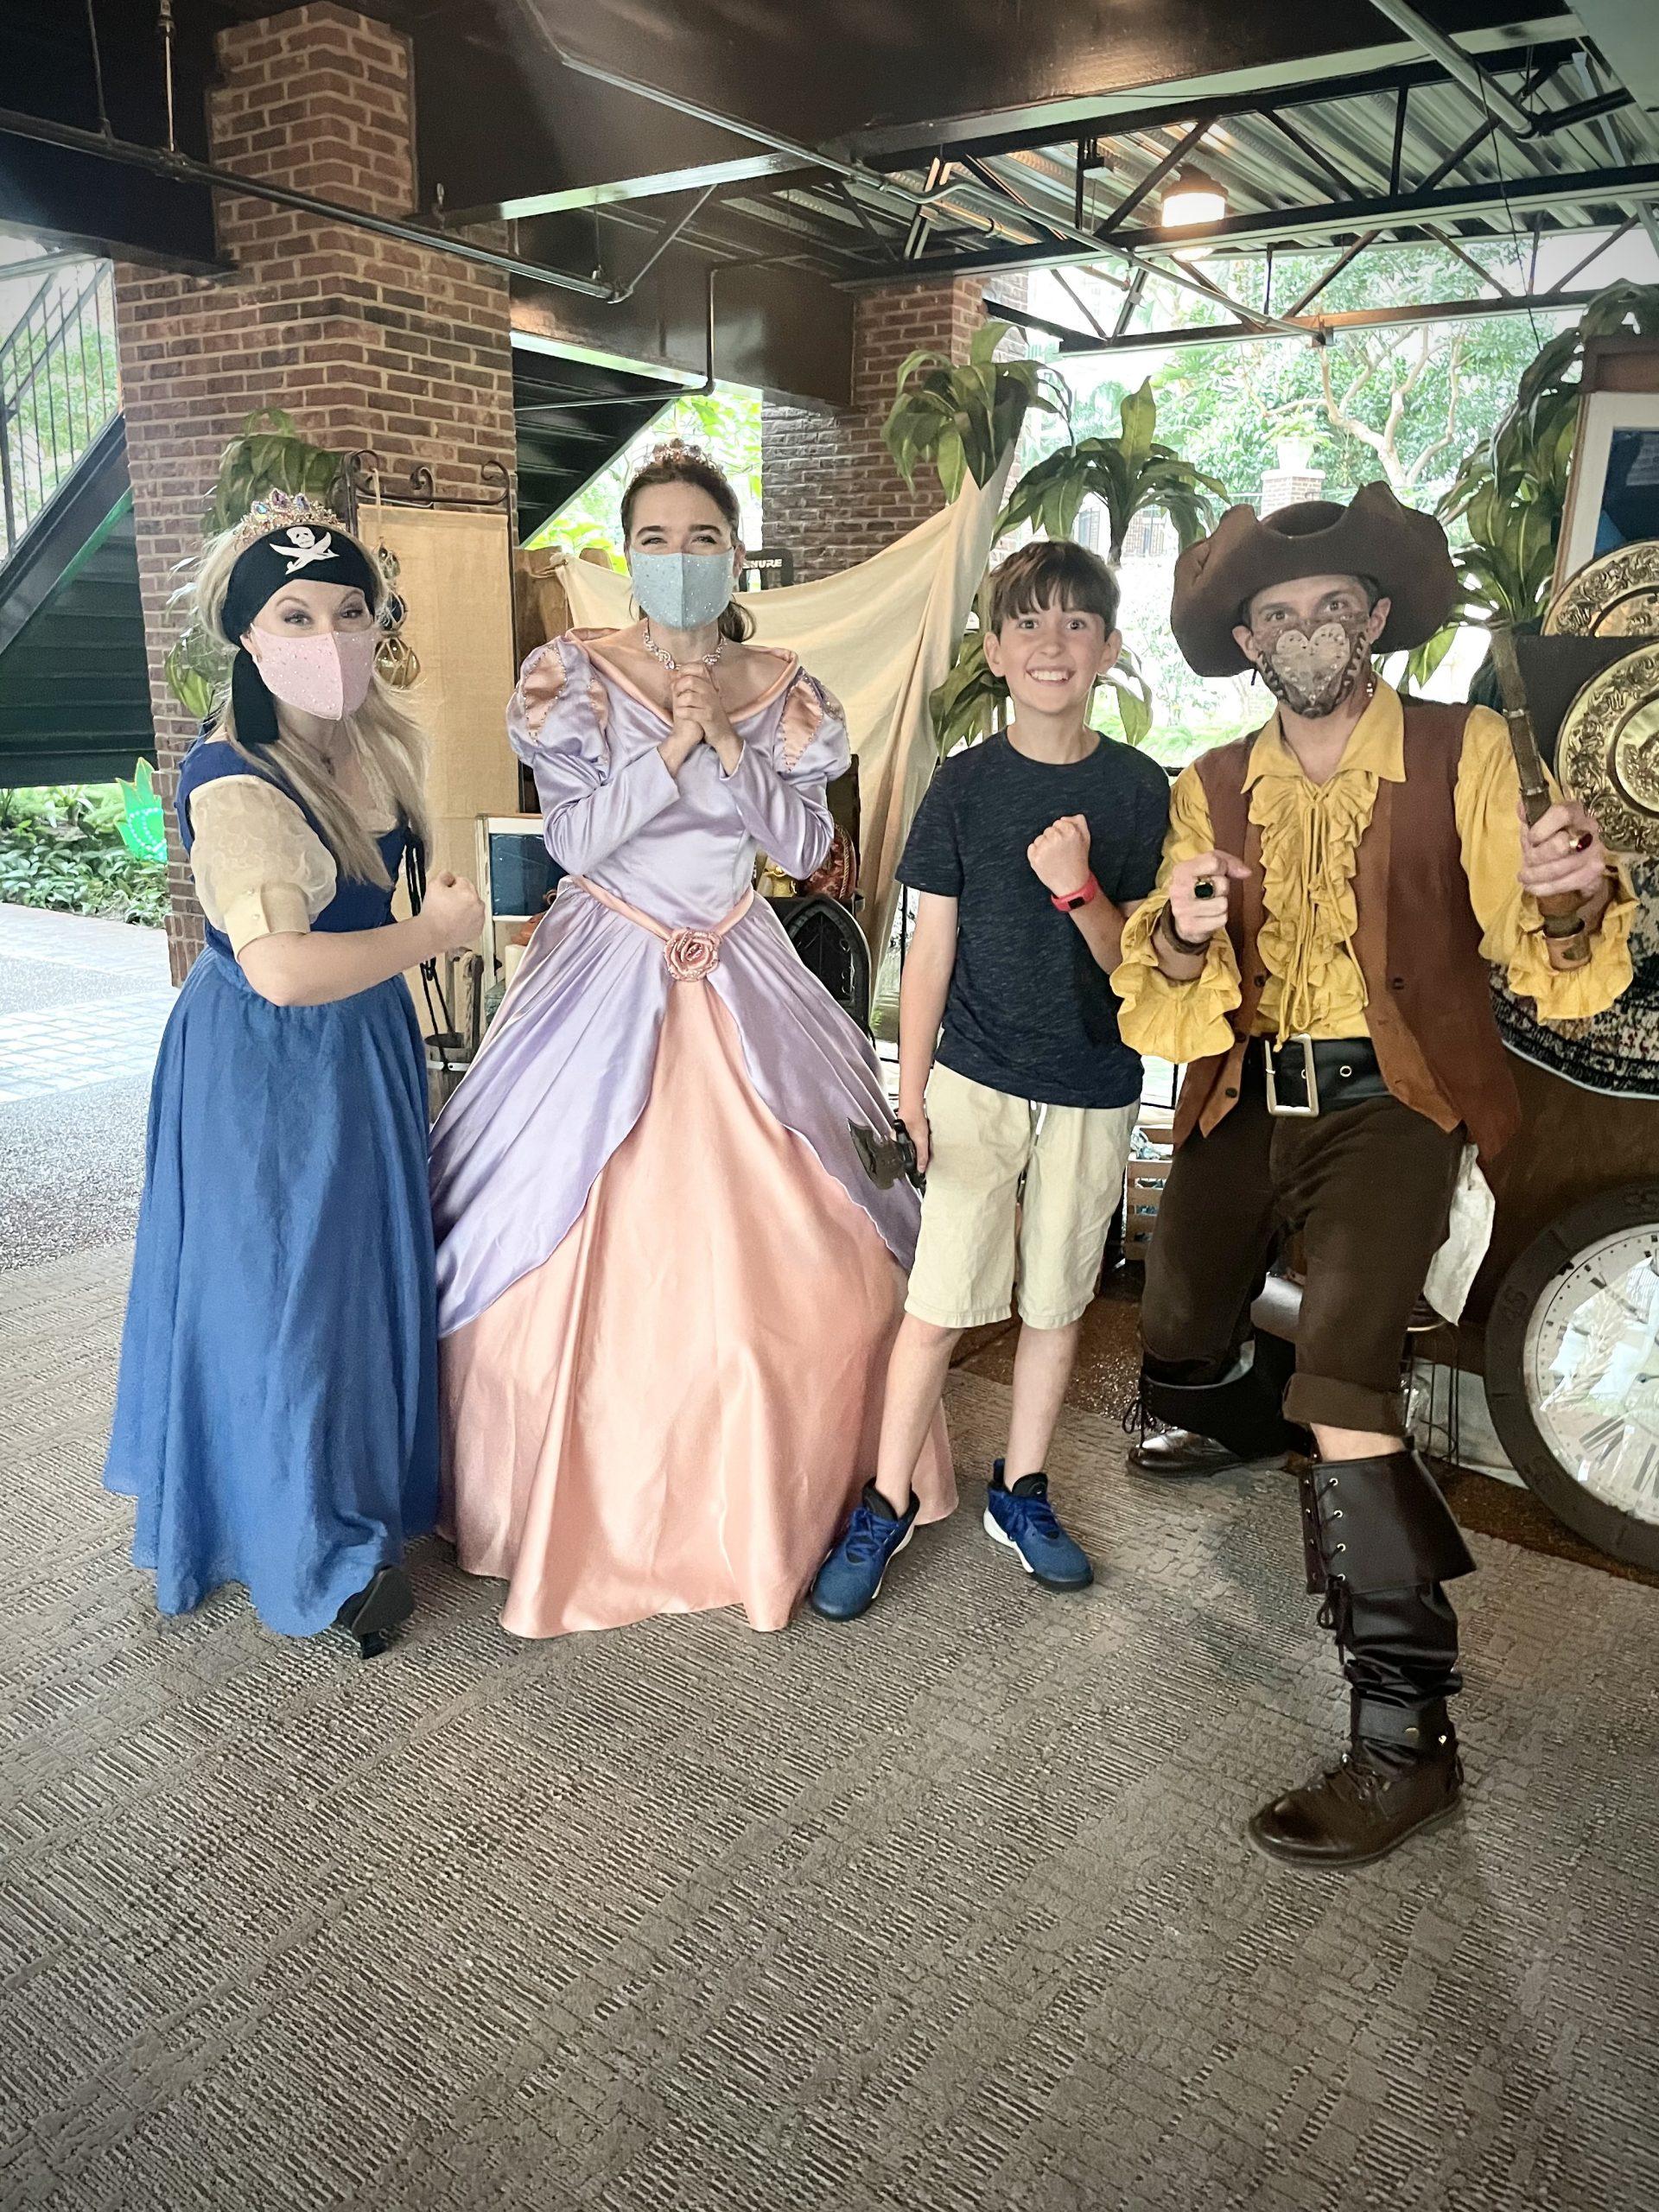 Princess and Pirate Academy